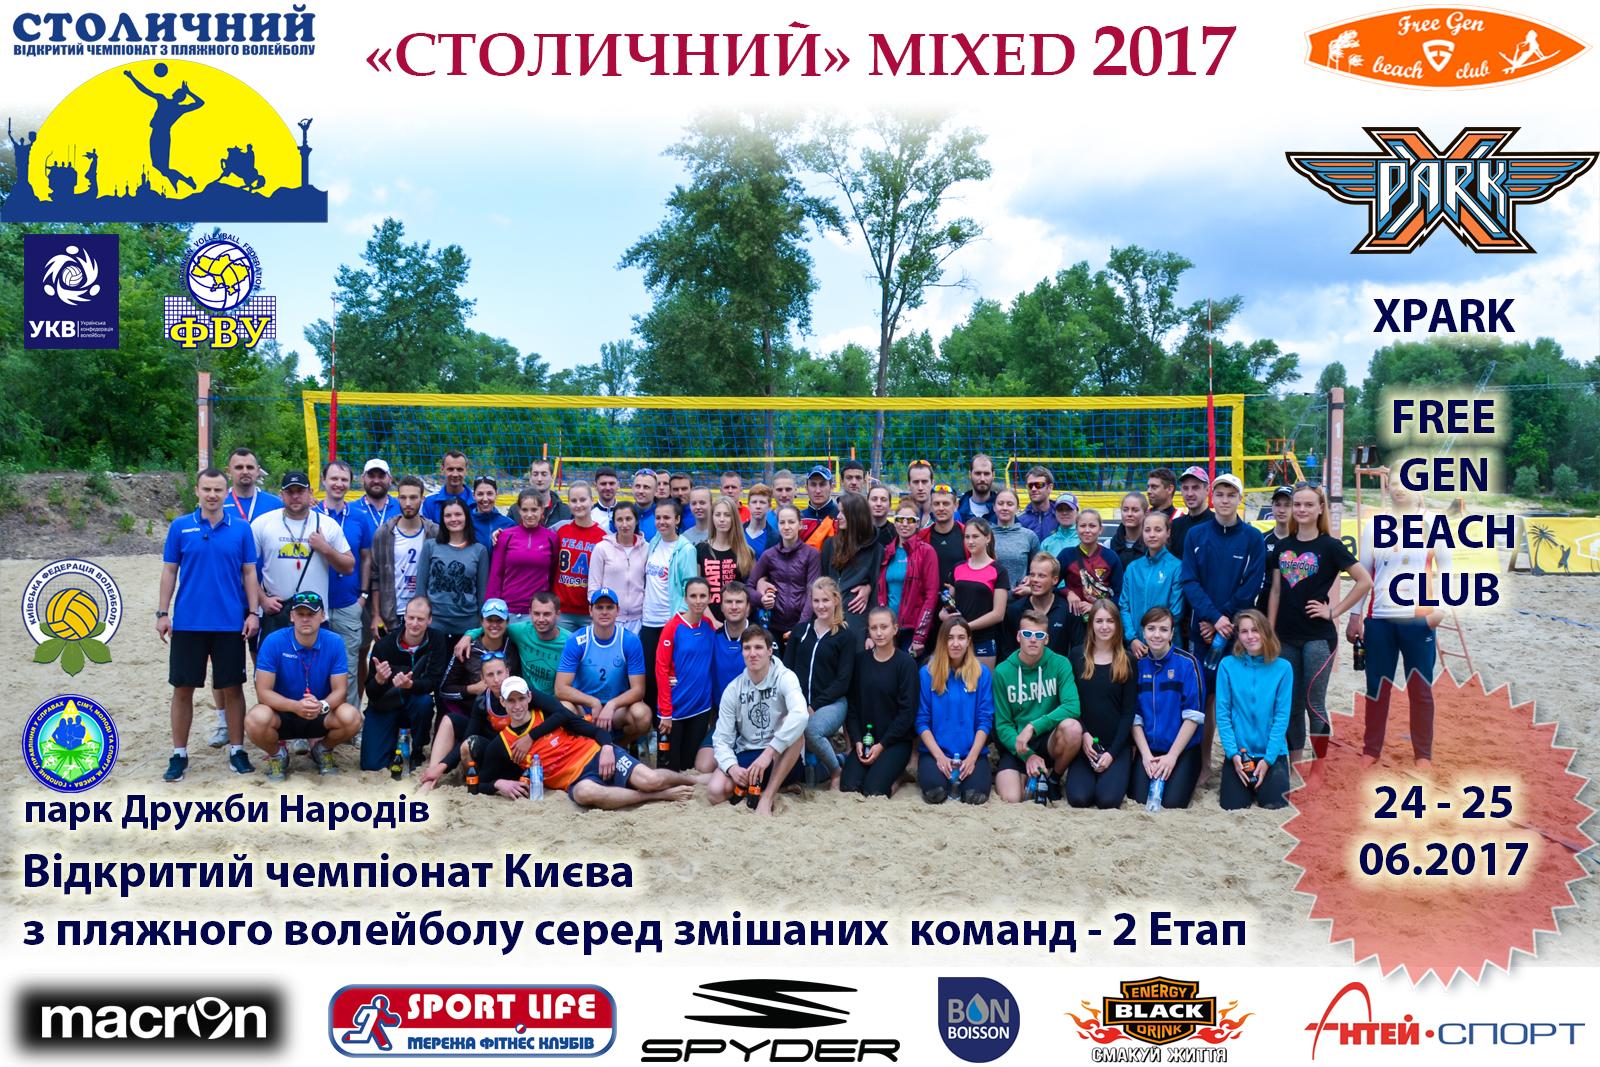 Пляжний волейбол. Mixed 2017 - 2 Етап